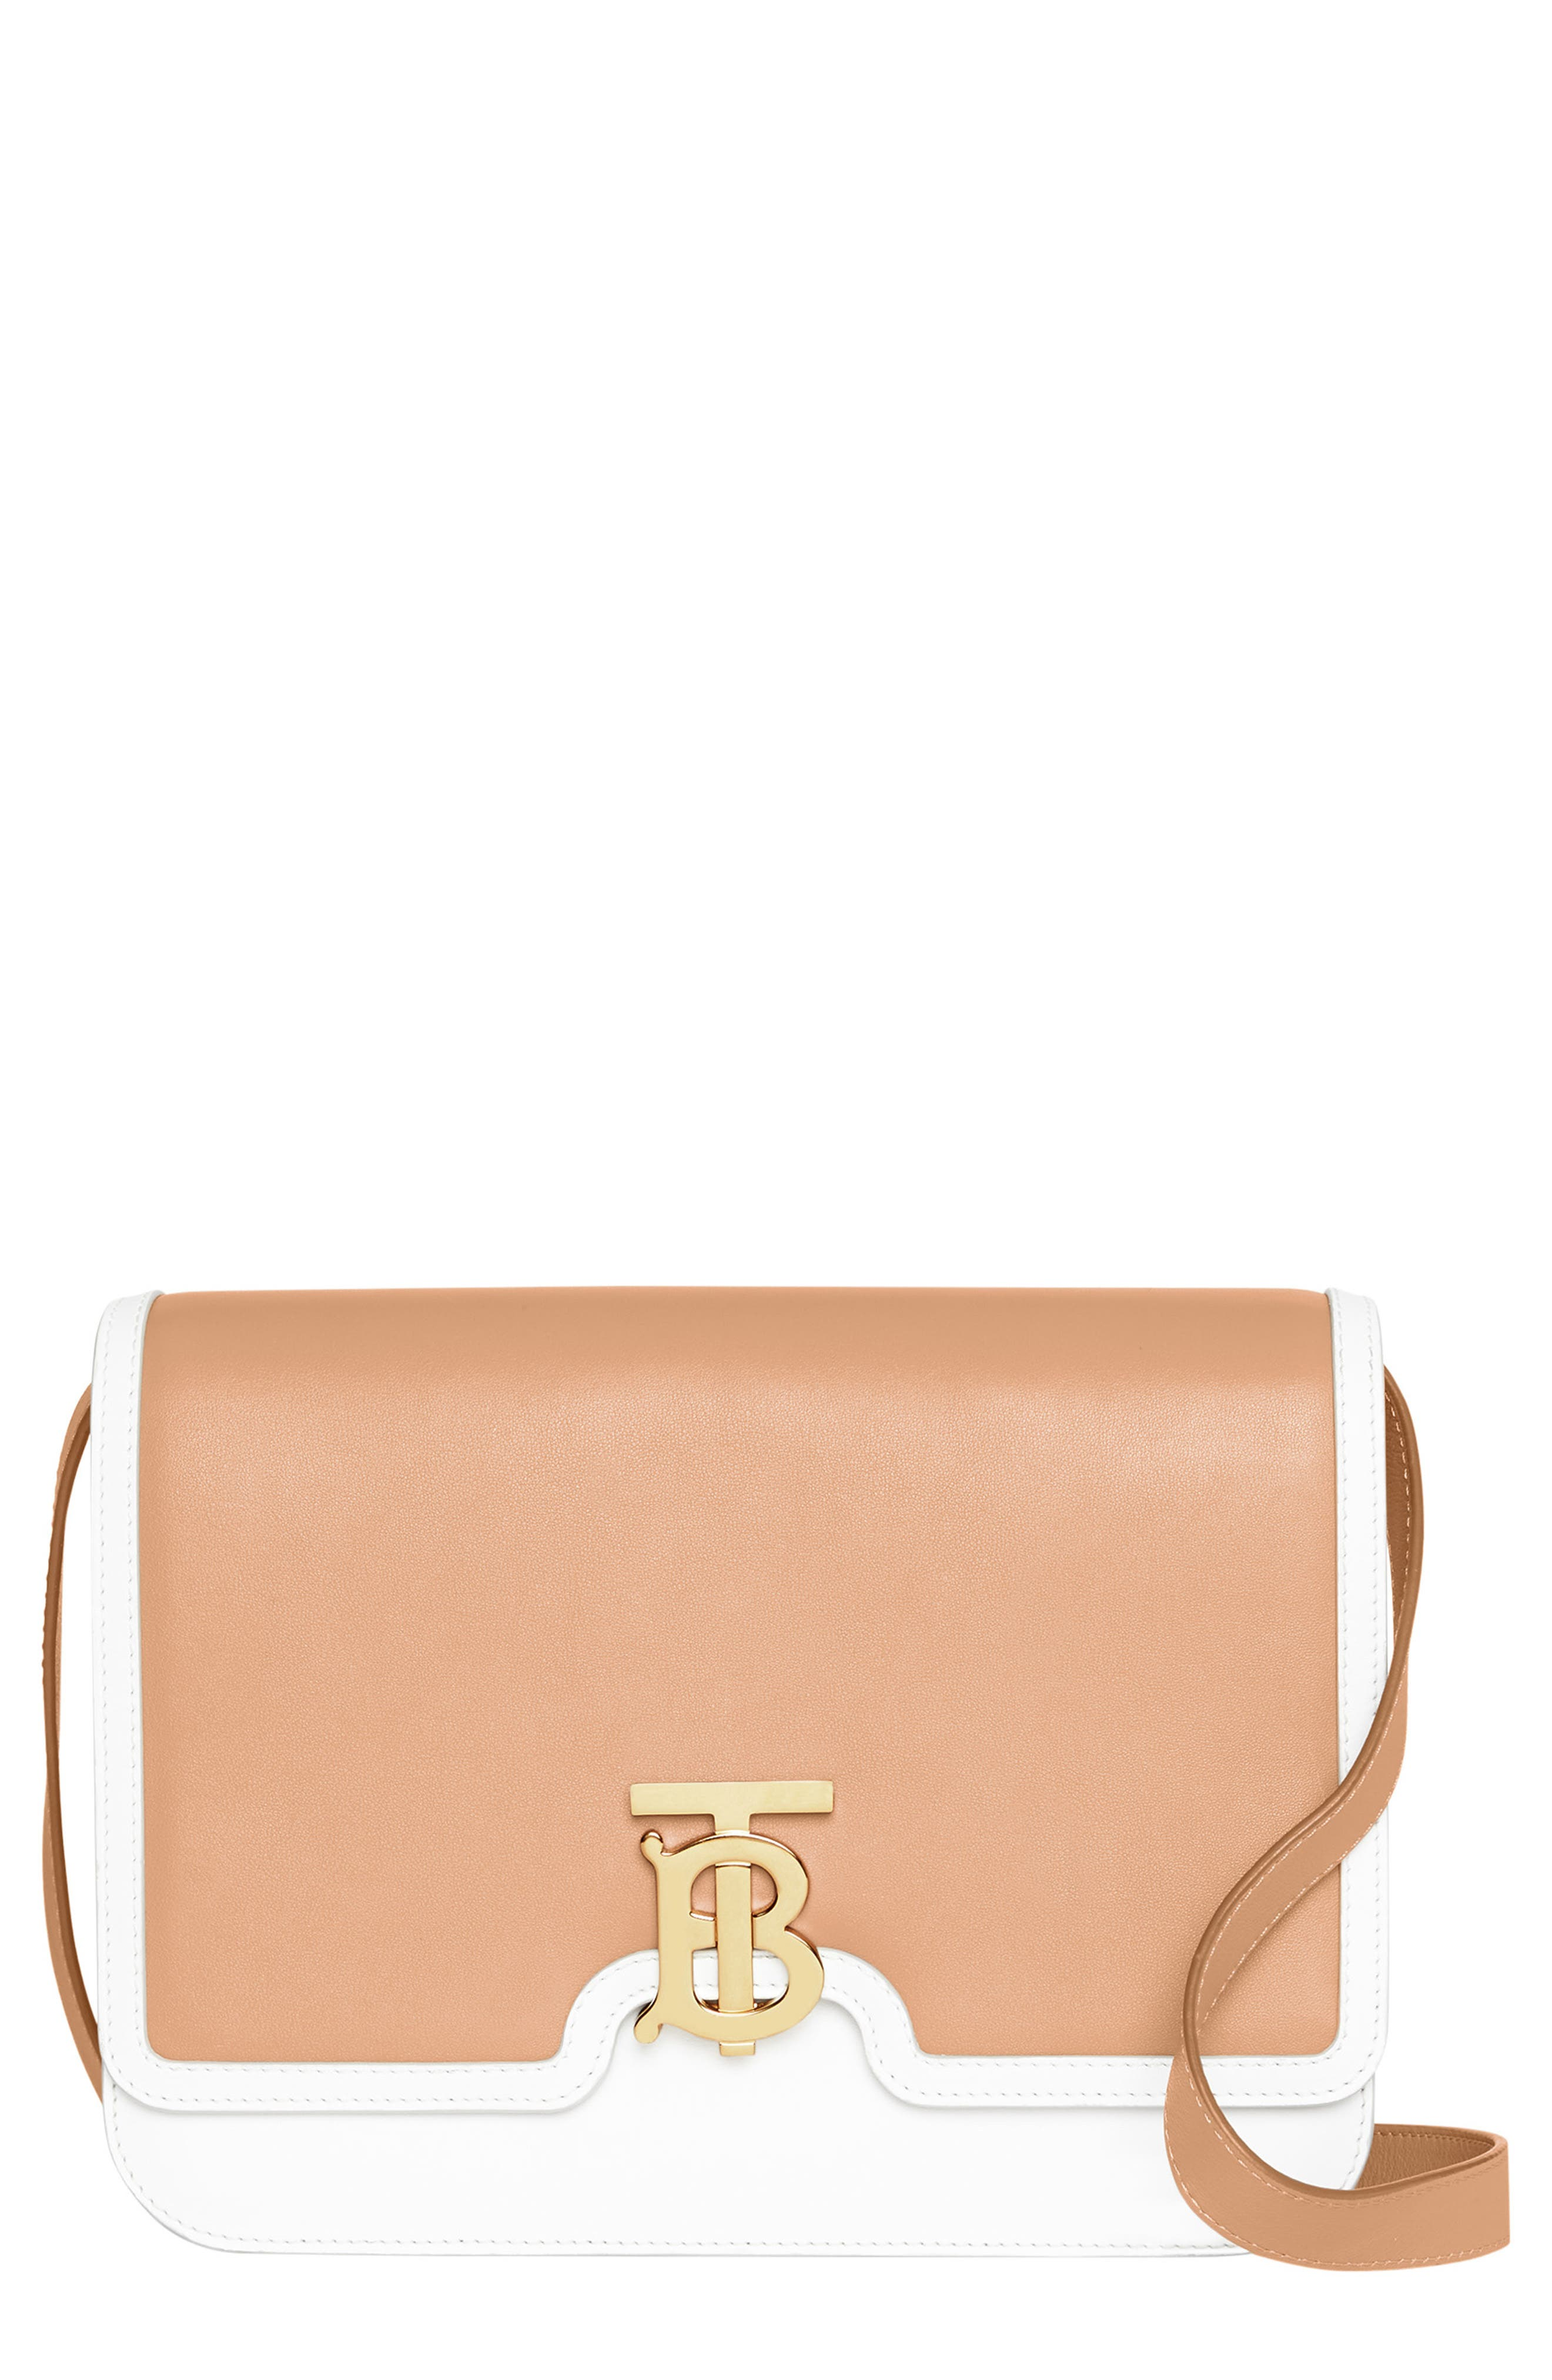 BURBERRY,                             Medium Two-Tone Leather TB Bag,                             Main thumbnail 1, color,                             CHALK WHITE/ LIGHT CAMEL